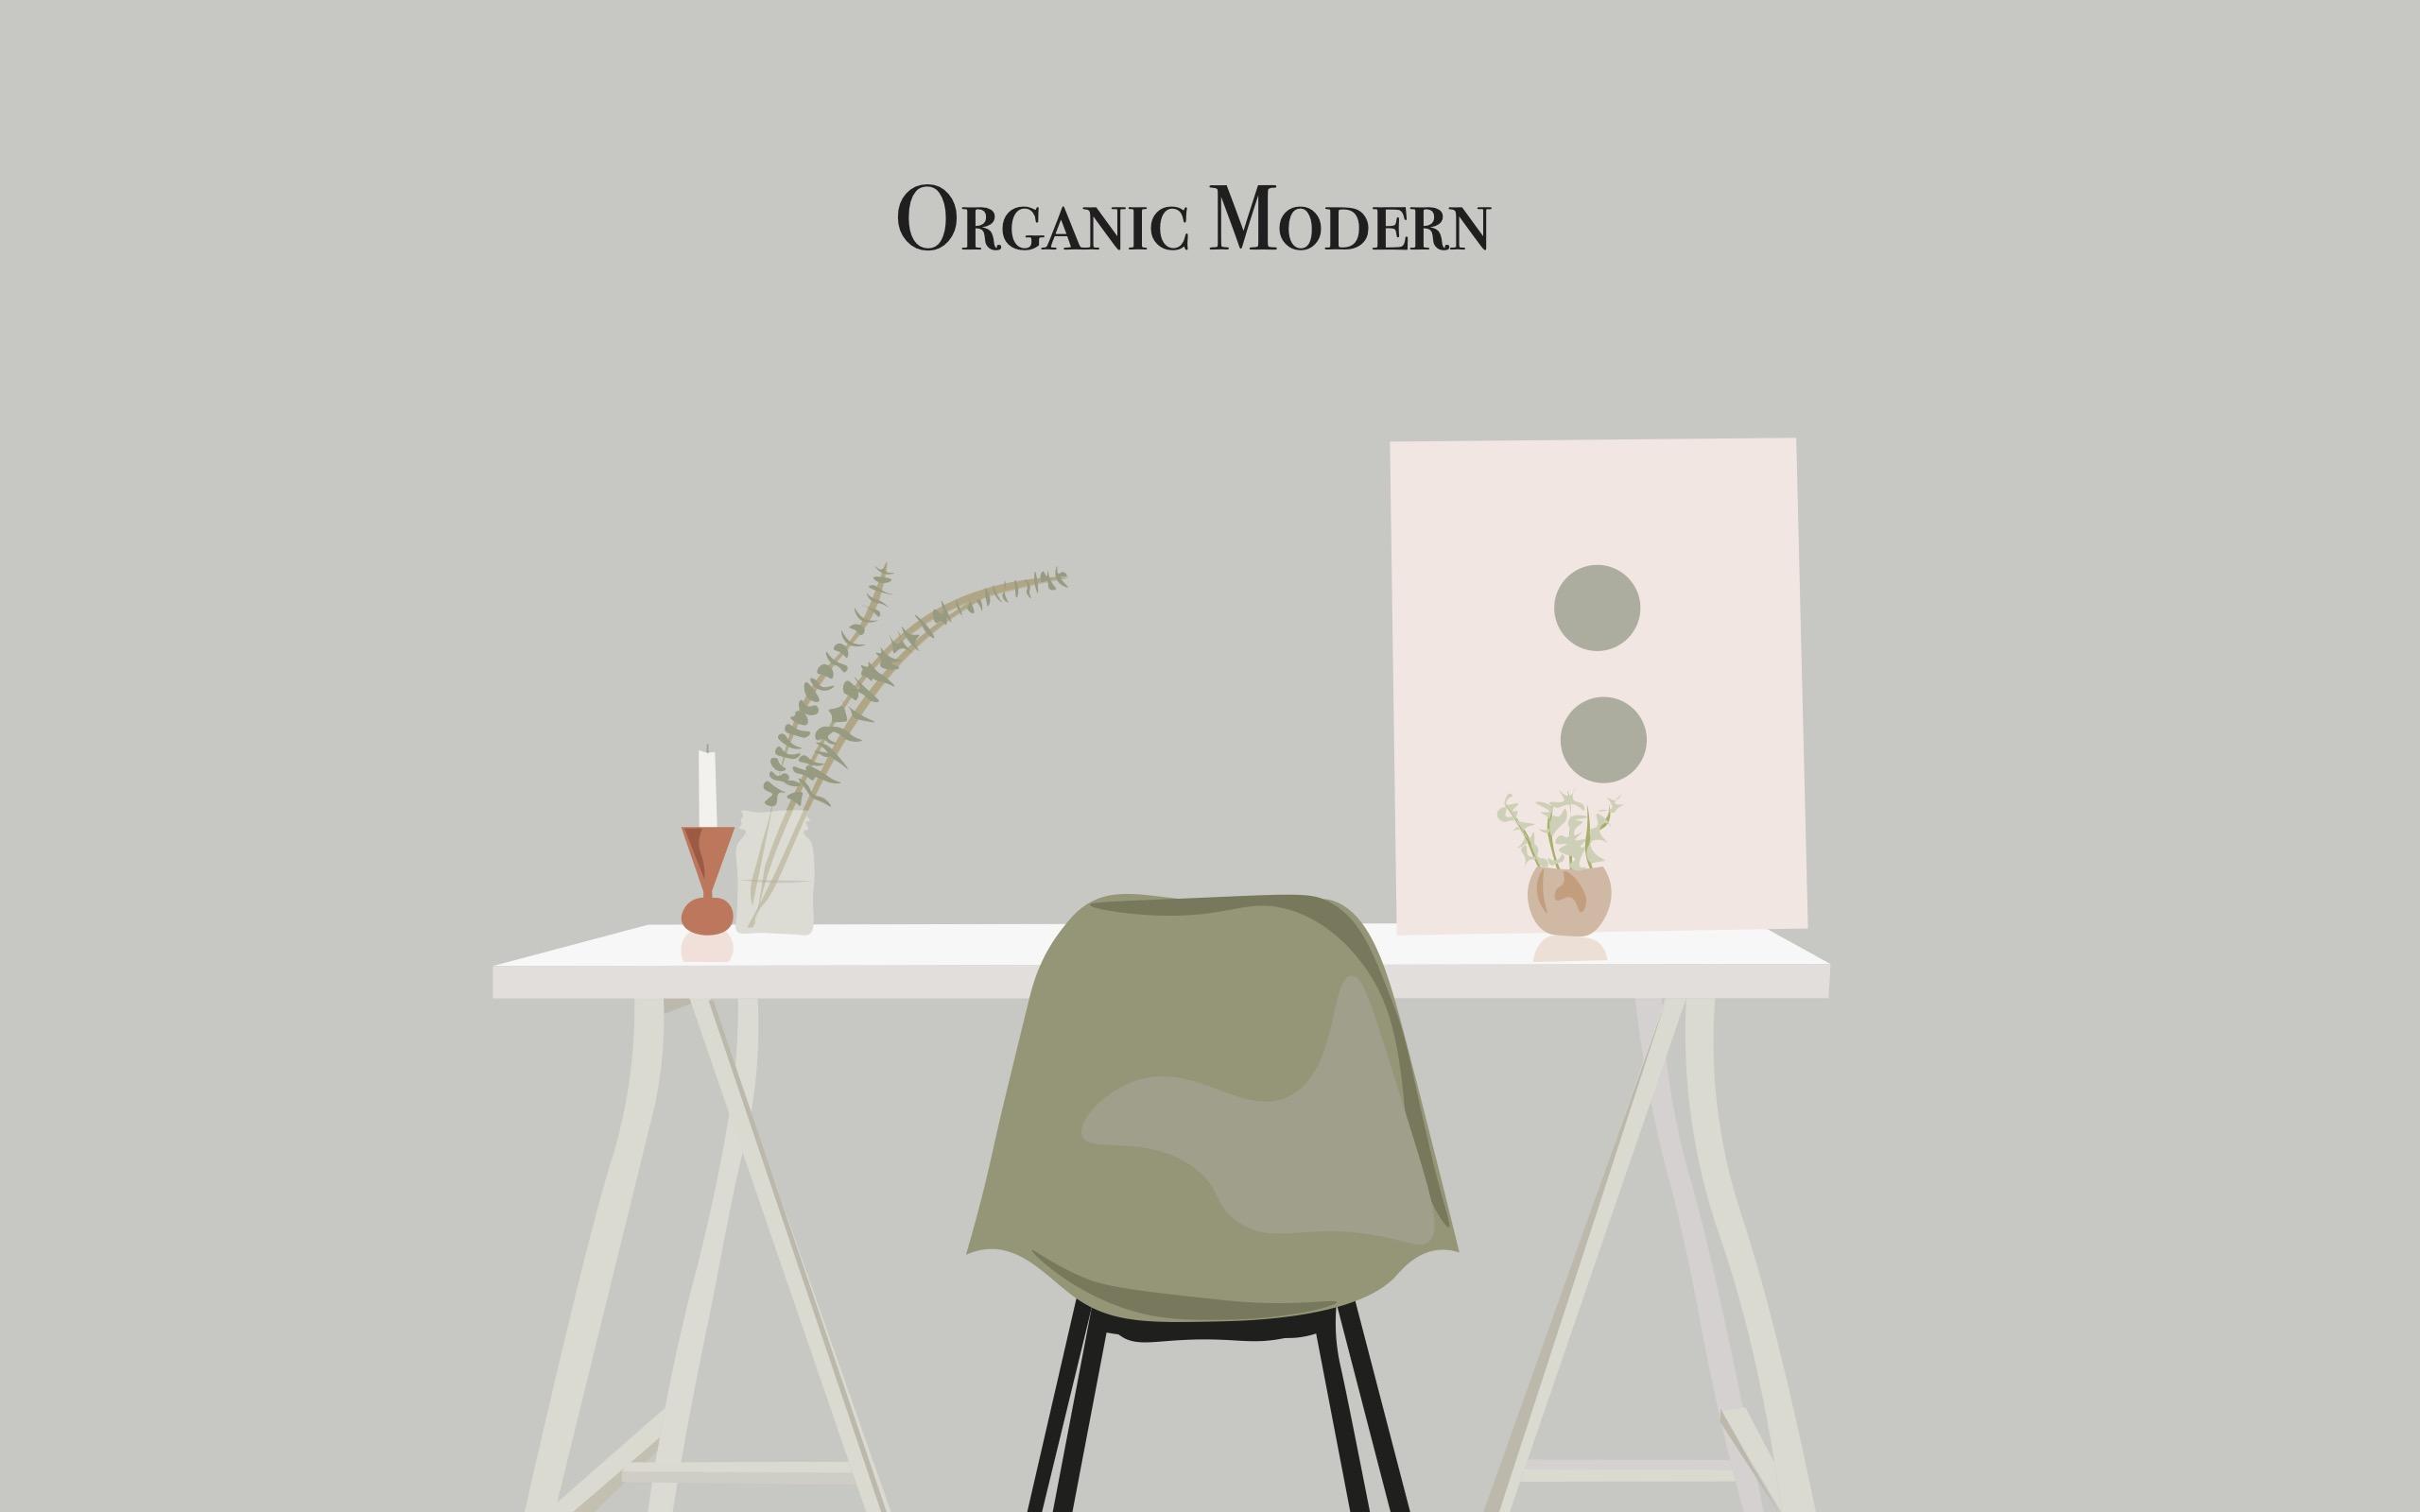 Organic Modern Style